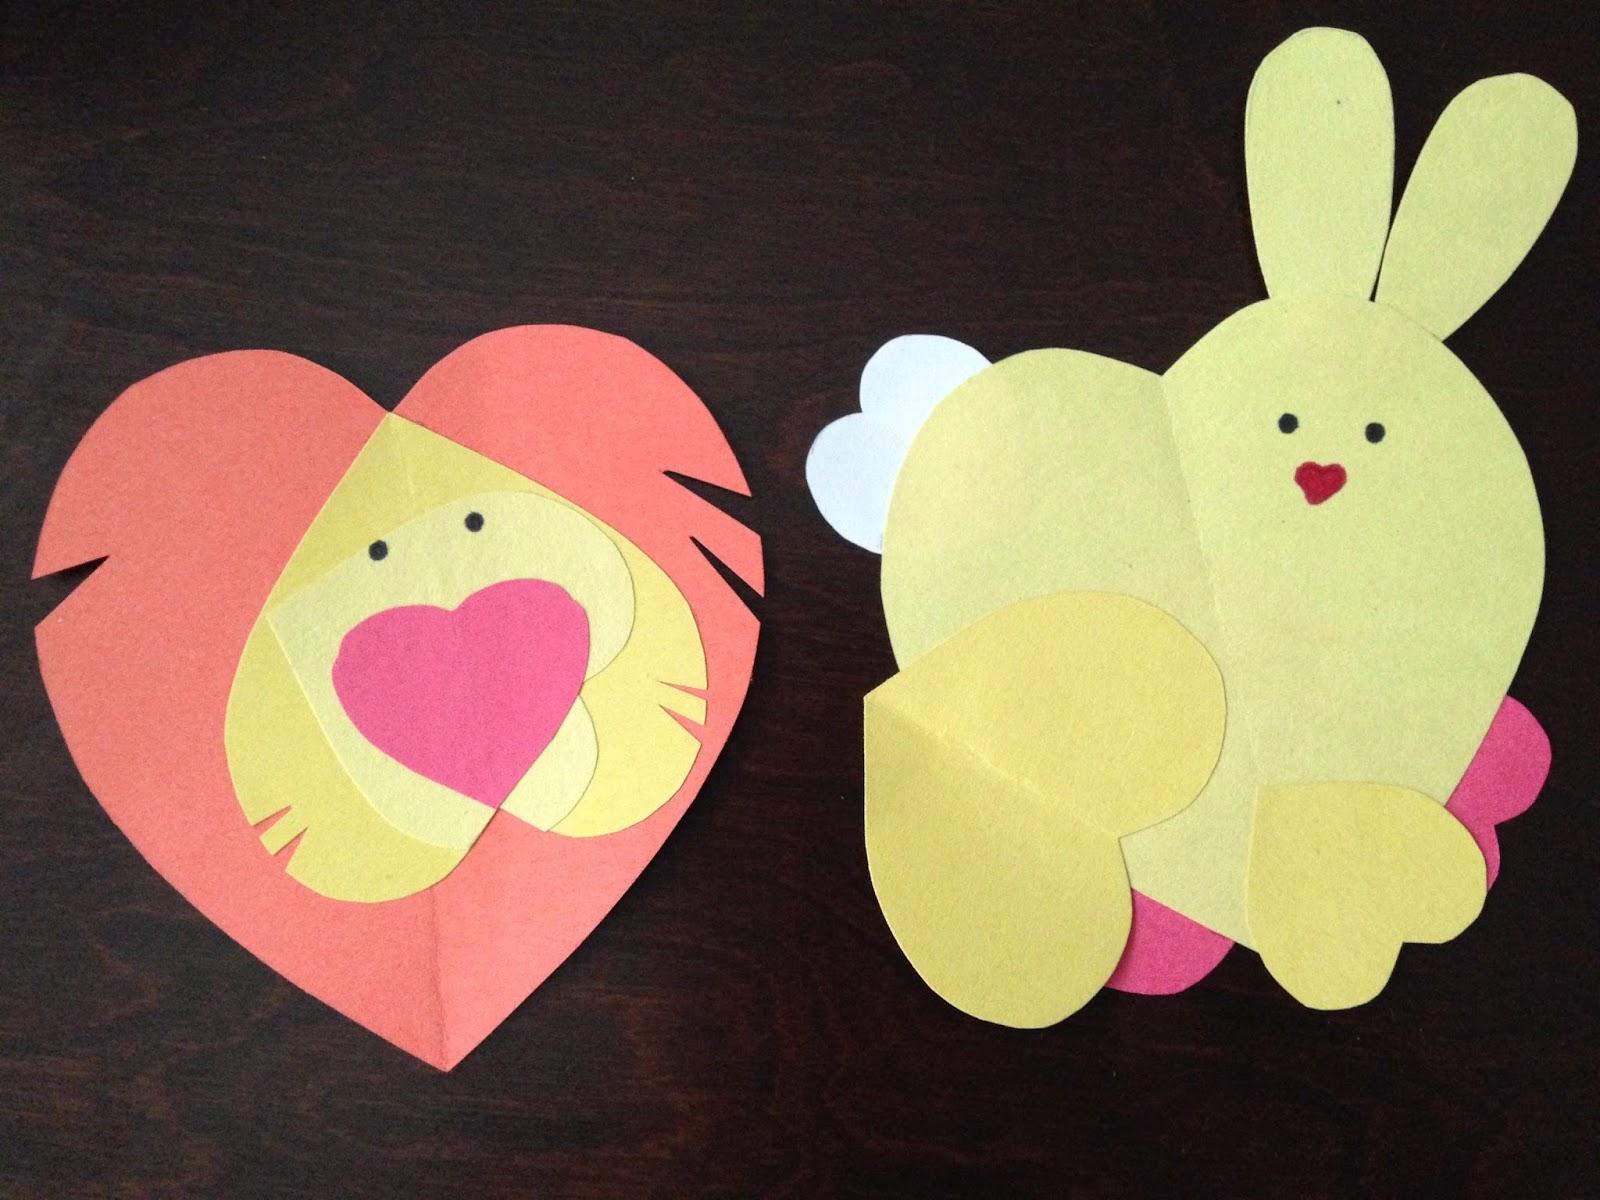 Frugal Allergy Mom Diy 5 Minute Valentine S Card Ideas Lion Heart